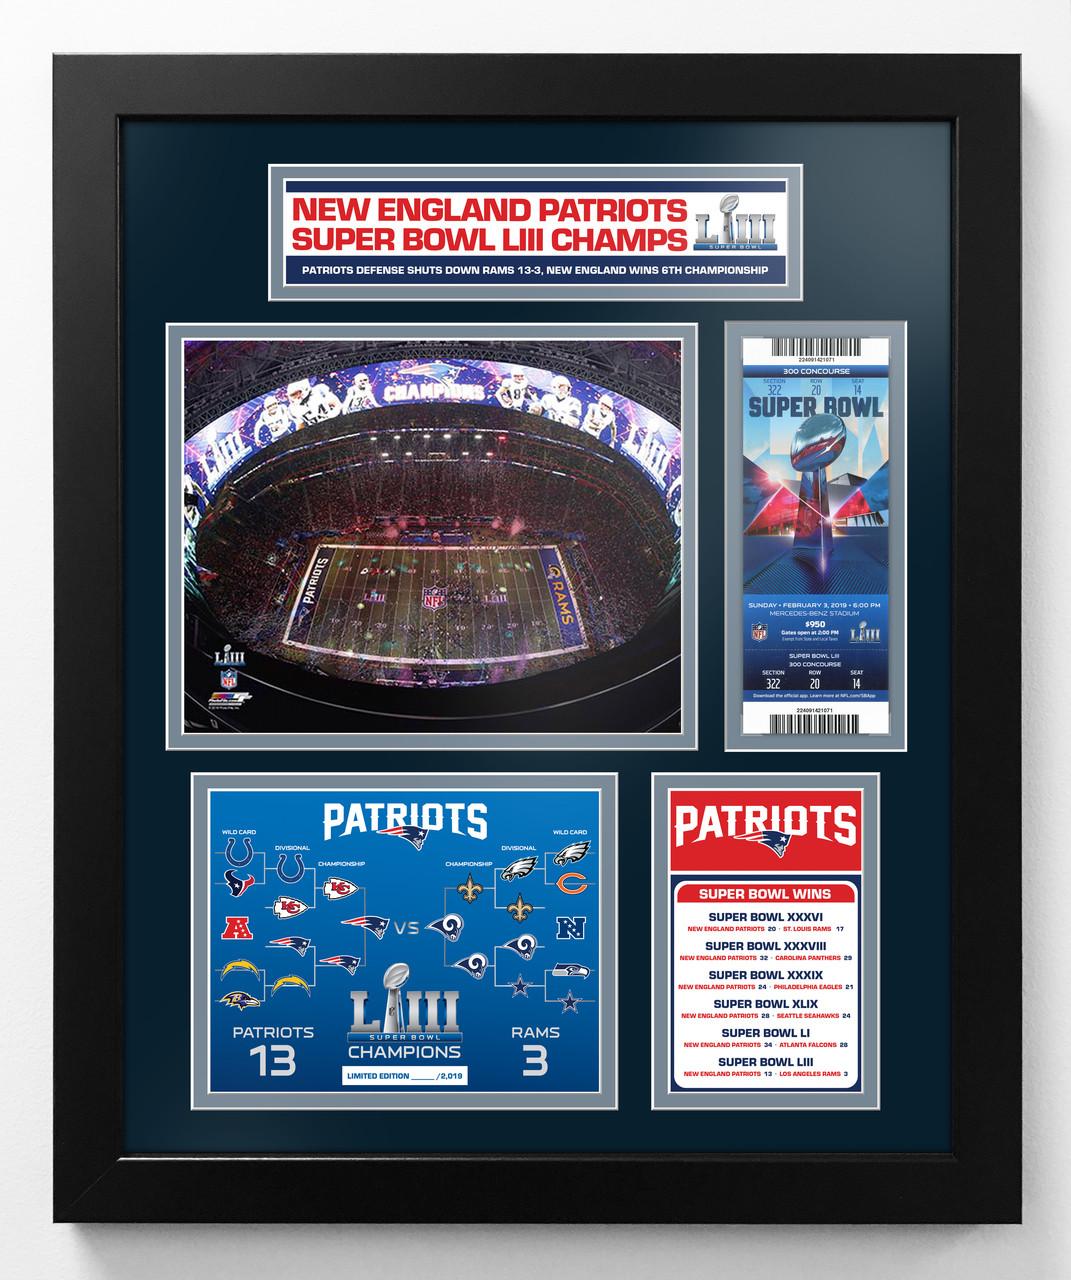 1d71e4fcbf4 Odell Beckham Jr Autographed New York Giants 16x20 Photo (Catch ...